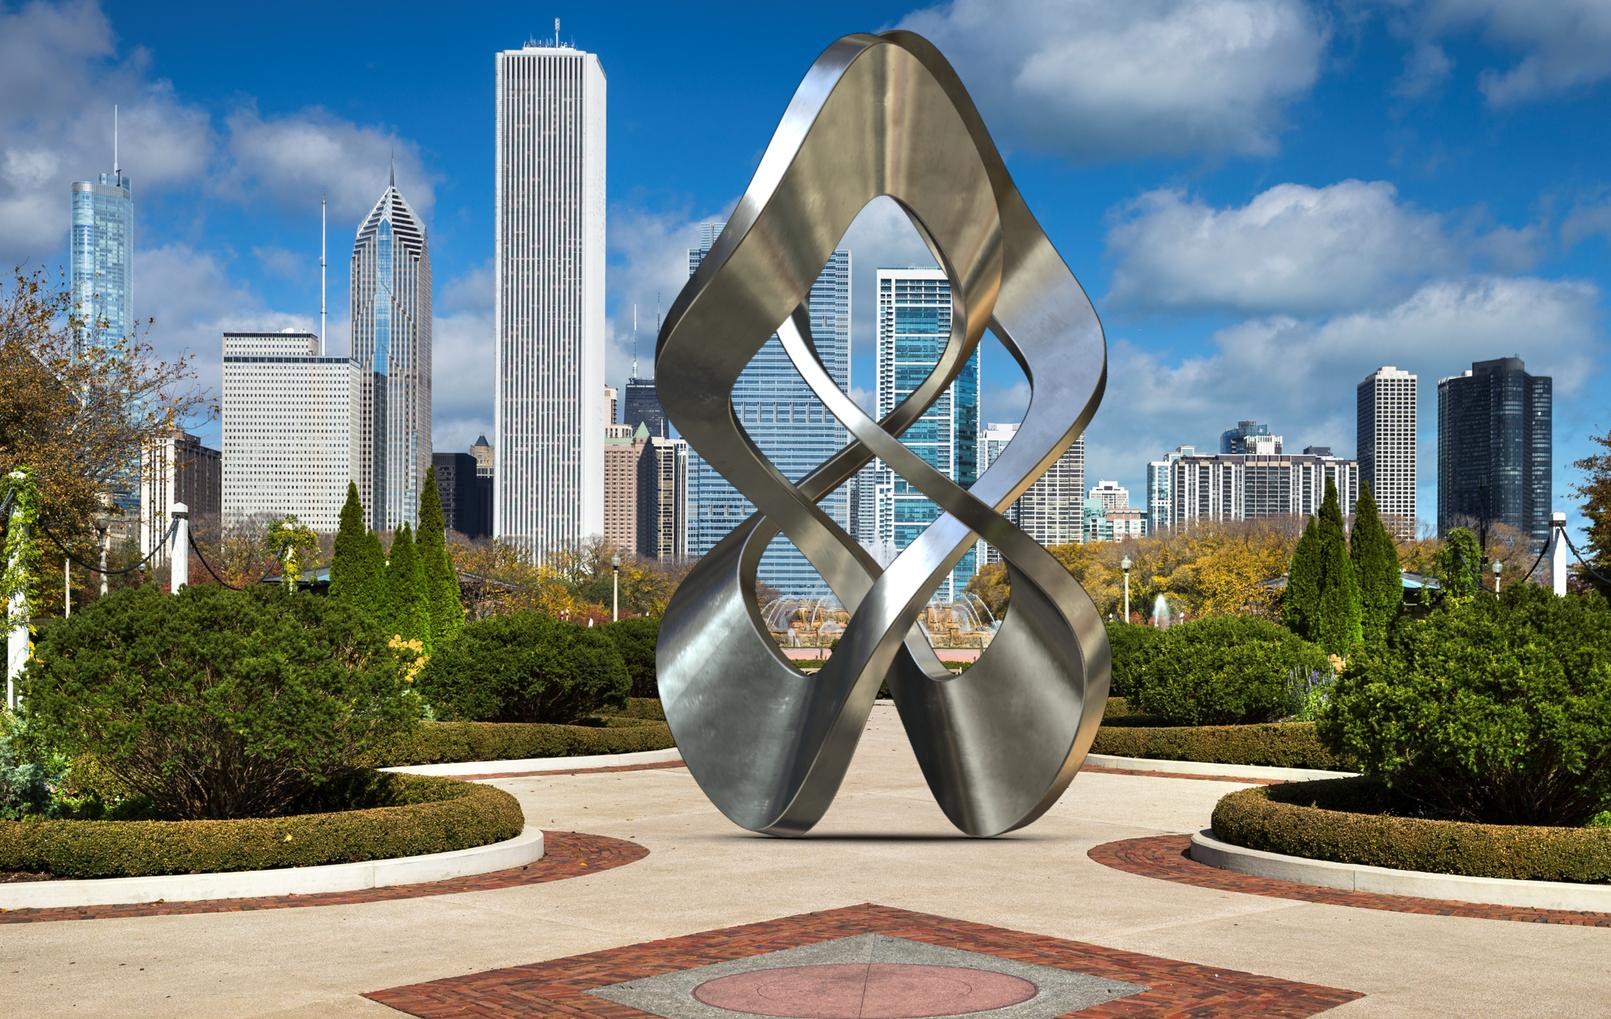 Chicago, USA | Clarence Buckingham Memorial